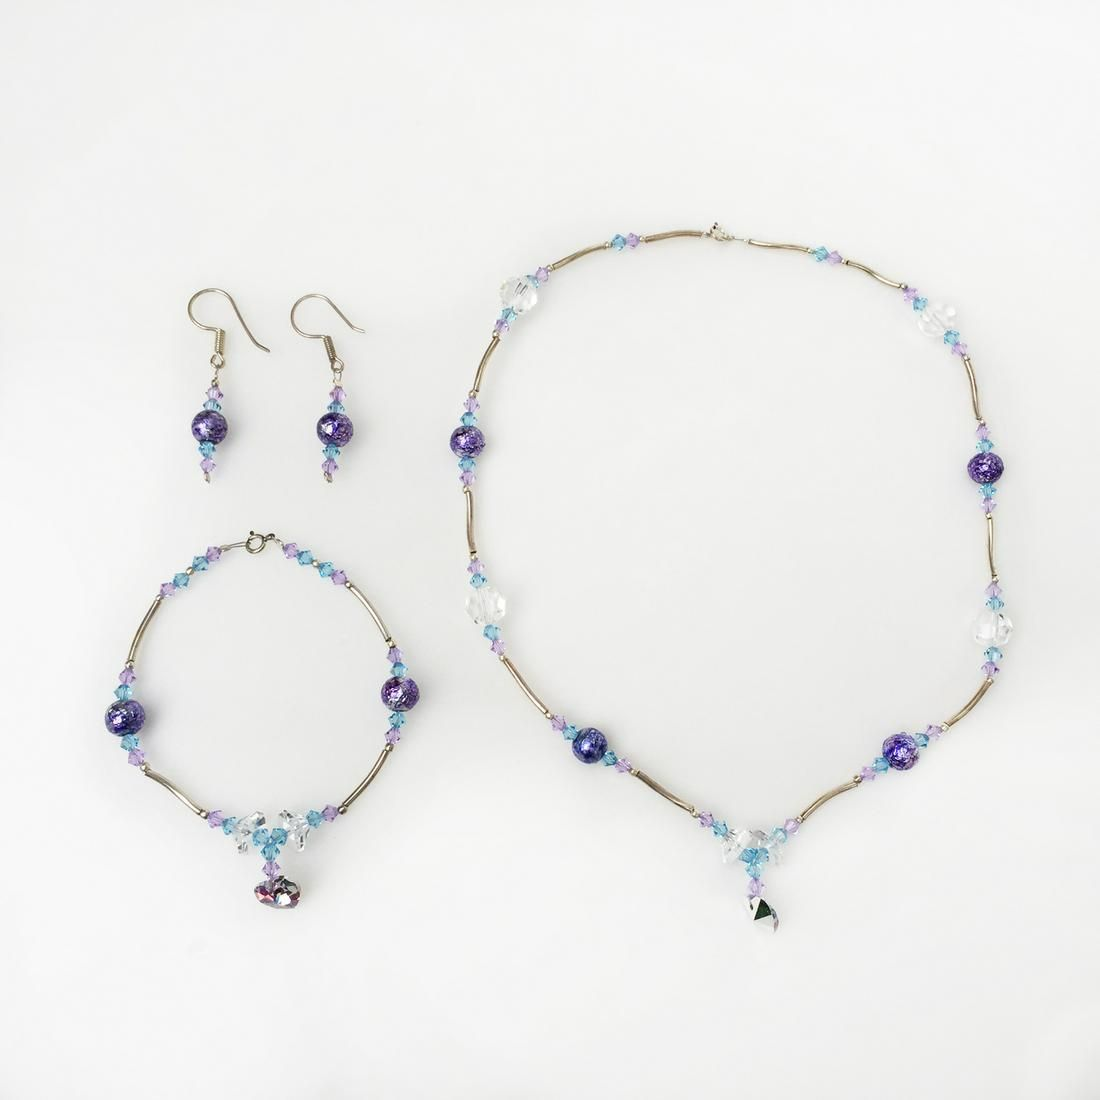 Crystals, sterling silver earrings necklace bracelet